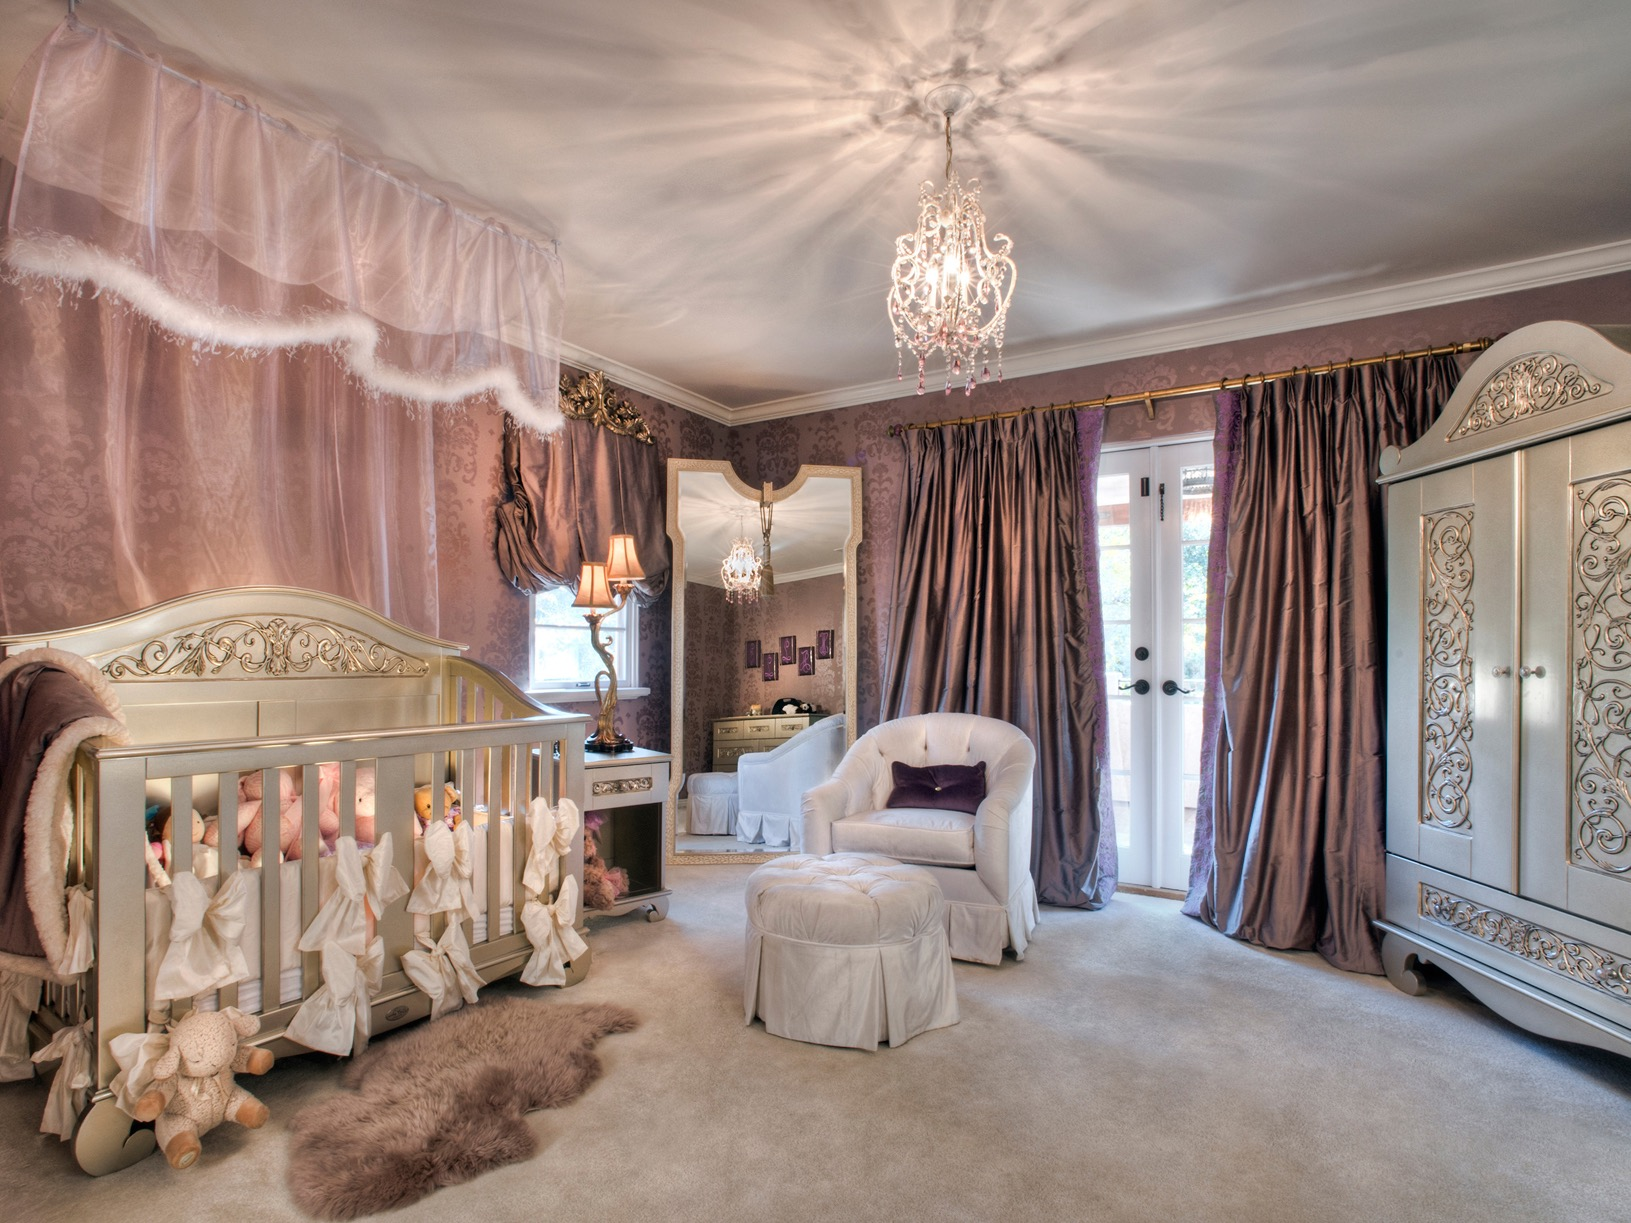 33 Baby Room Interior Decor And Design Ideas 18083